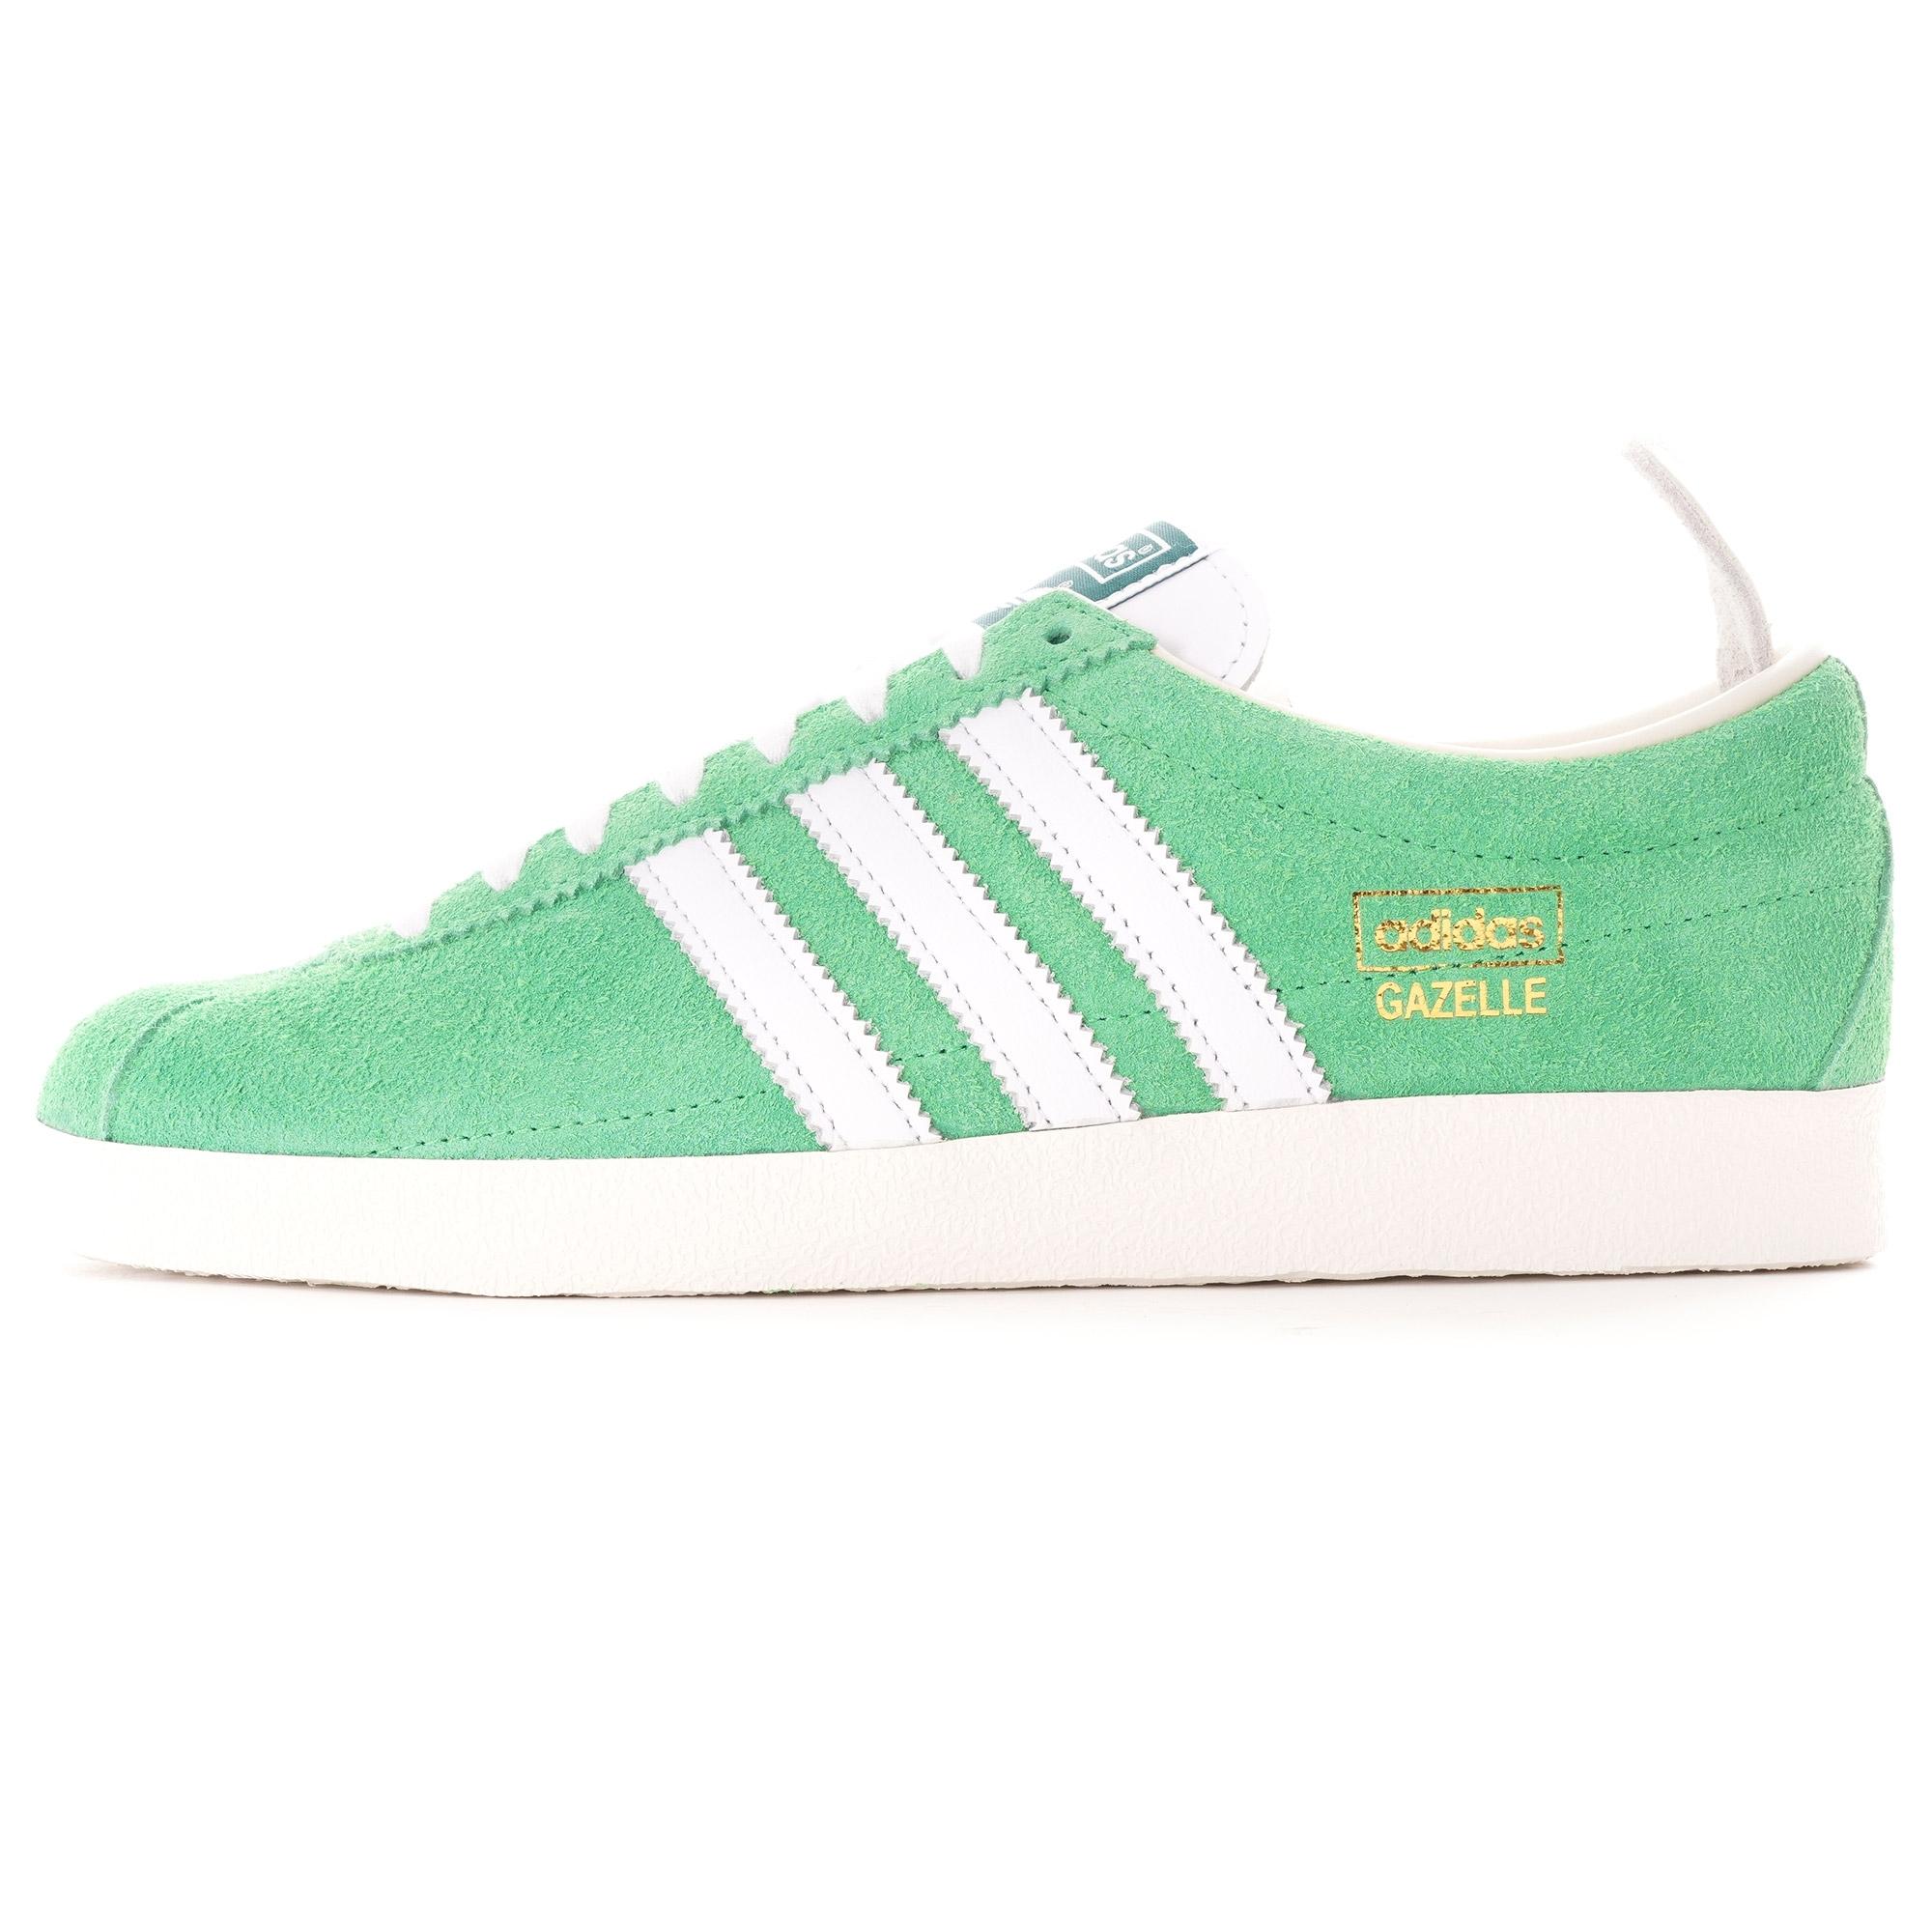 adidas shoes gazelle green